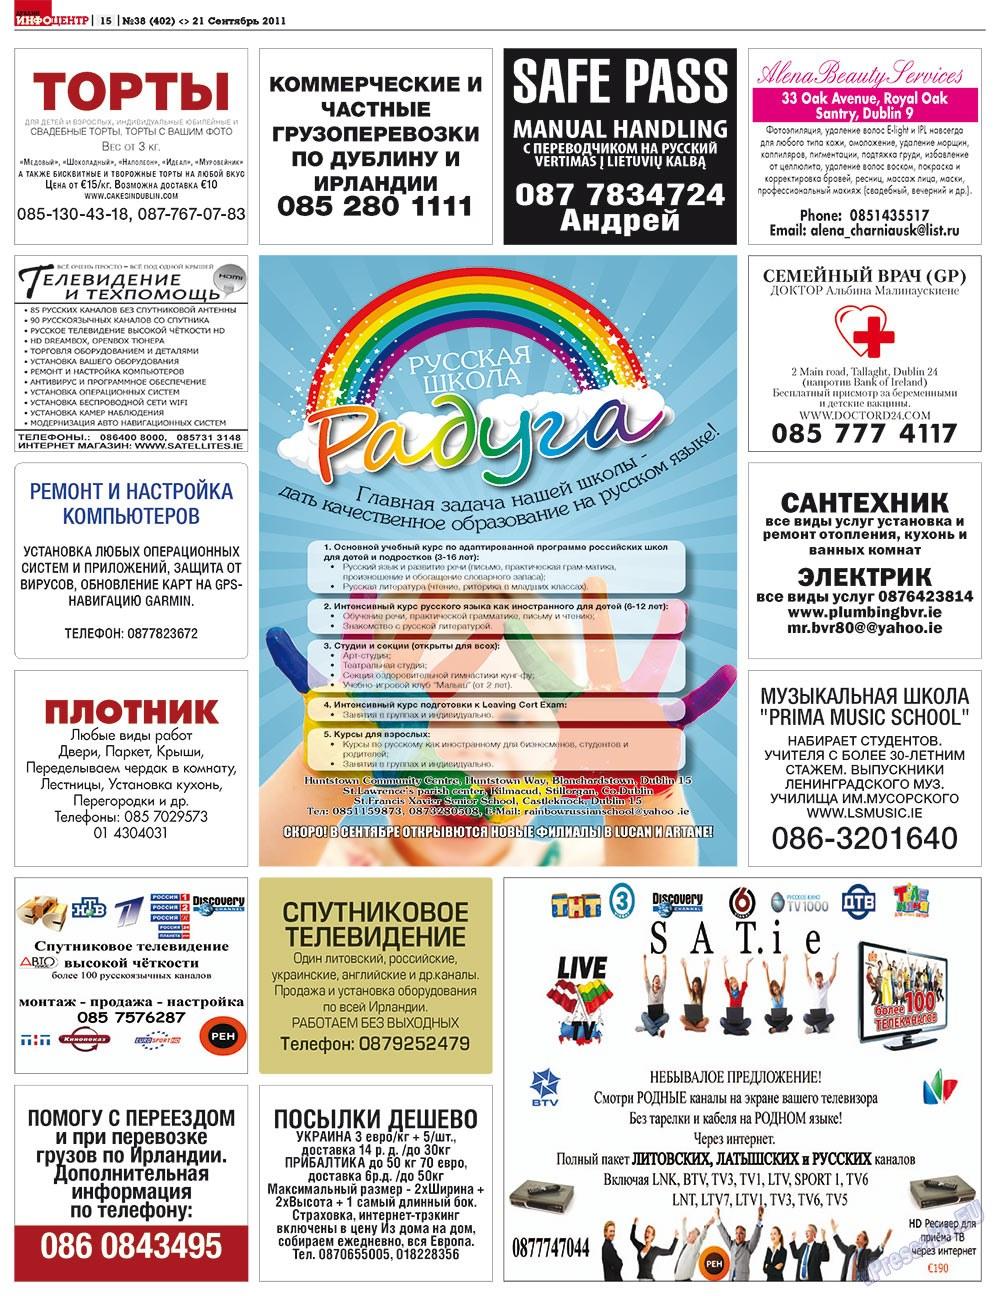 Дублин инфоцентр (газета). 2011 год, номер 38, стр. 15